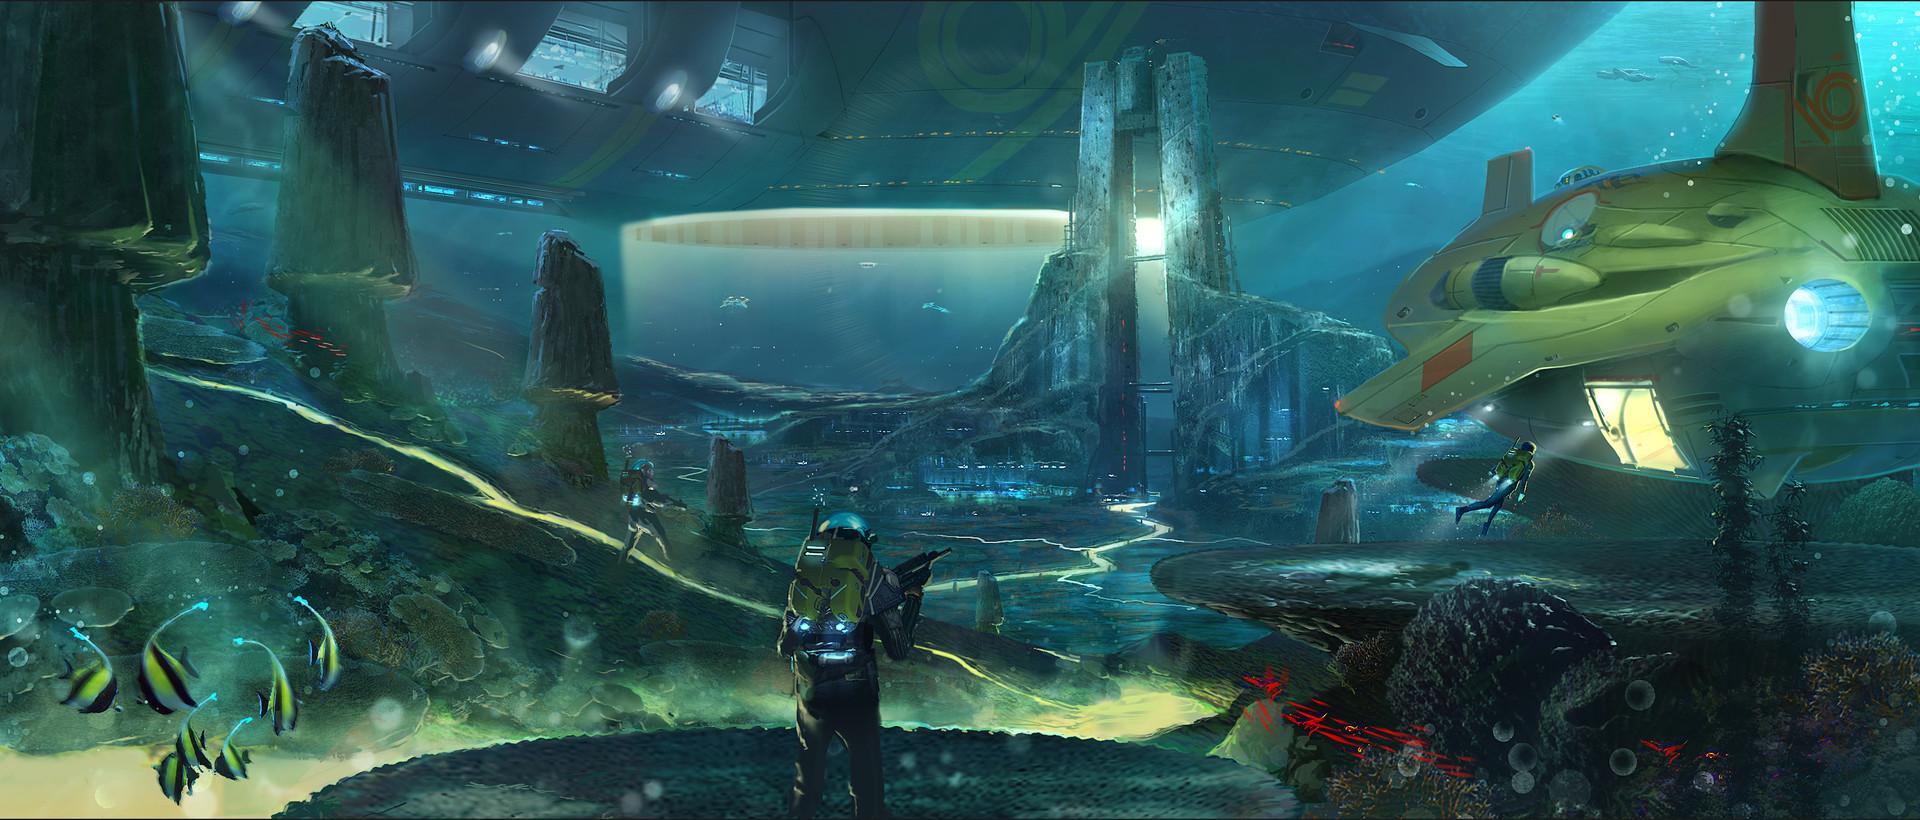 christian-piccolo-underwater-c.jpg?14774